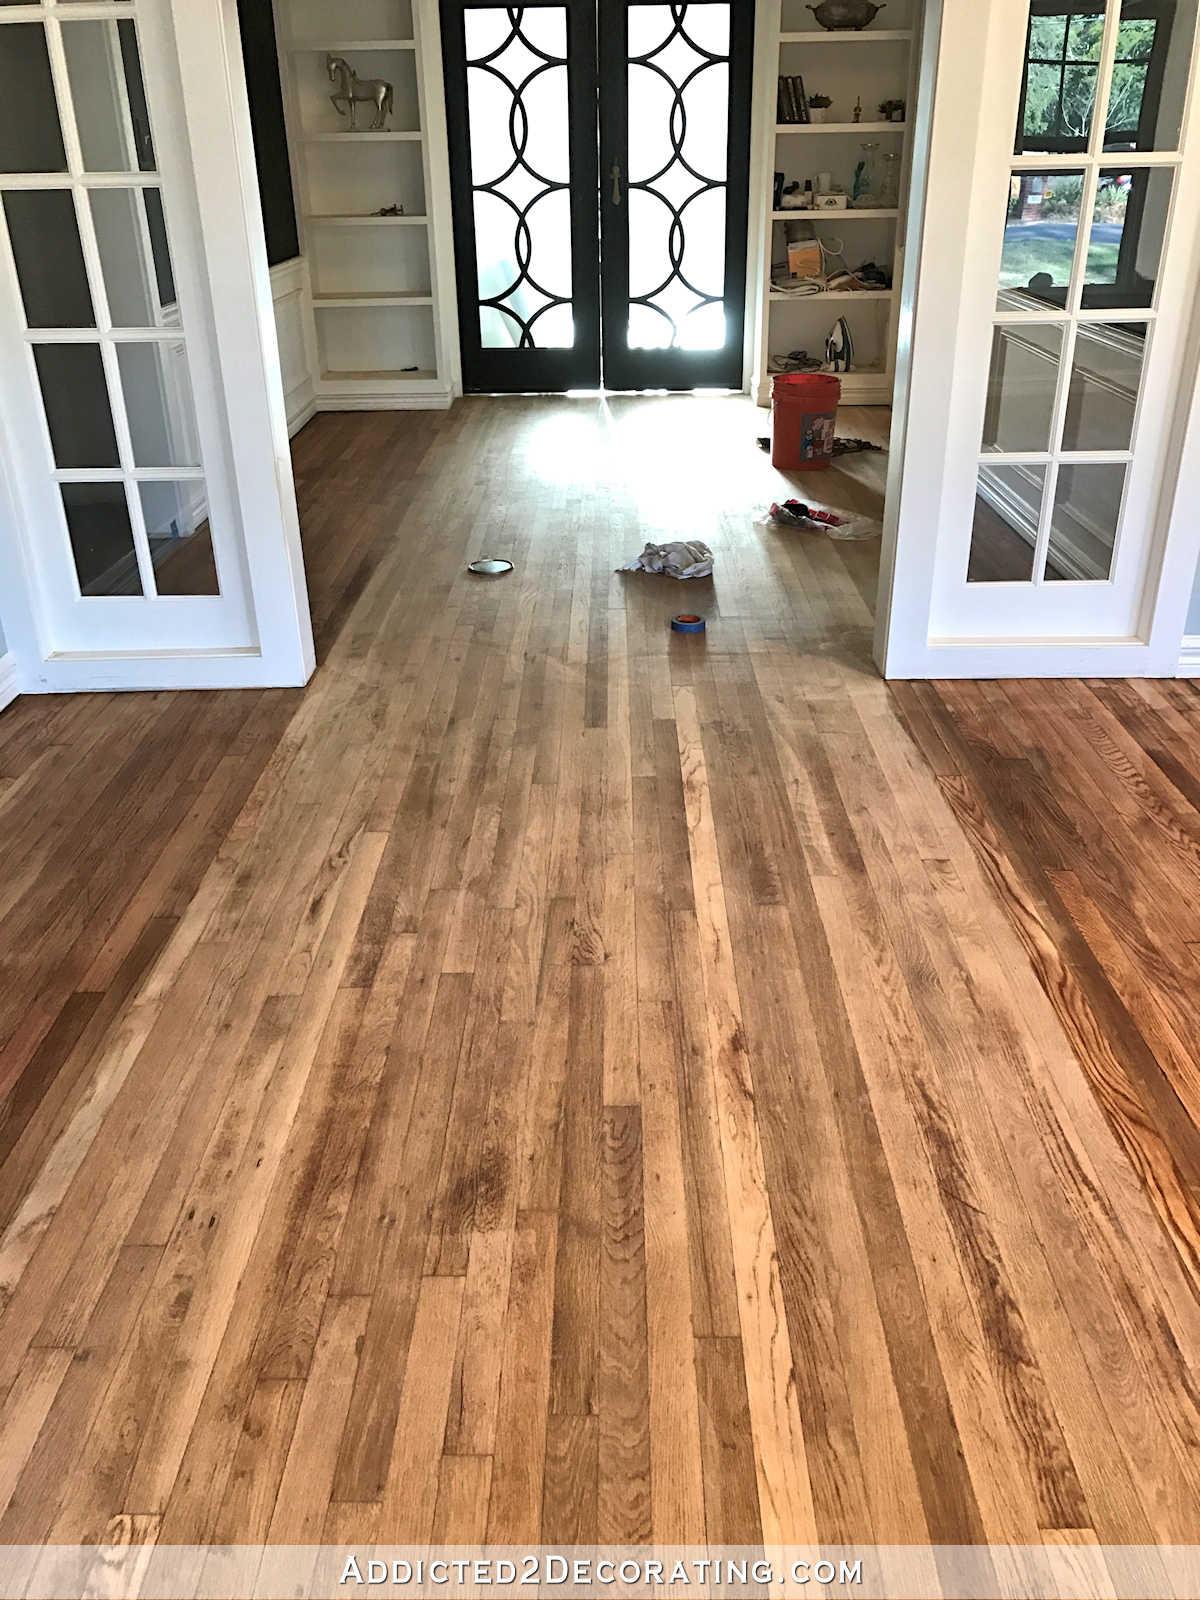 2 1 2 hardwood flooring of adventures in staining my red oak hardwood floors products process in staining red oak hardwood floors 5 music room wood conditioner